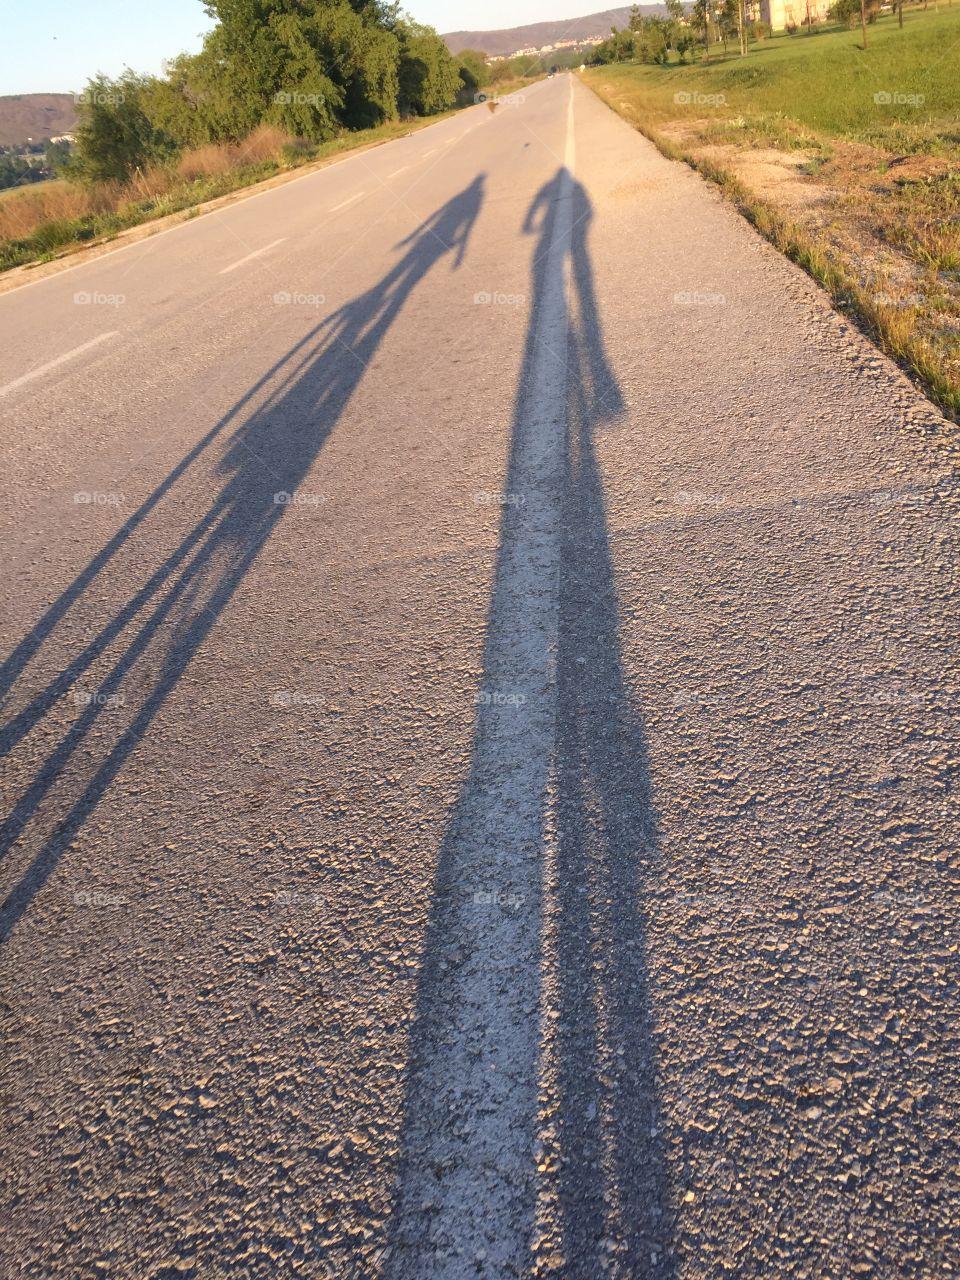 Shadows of Friendship